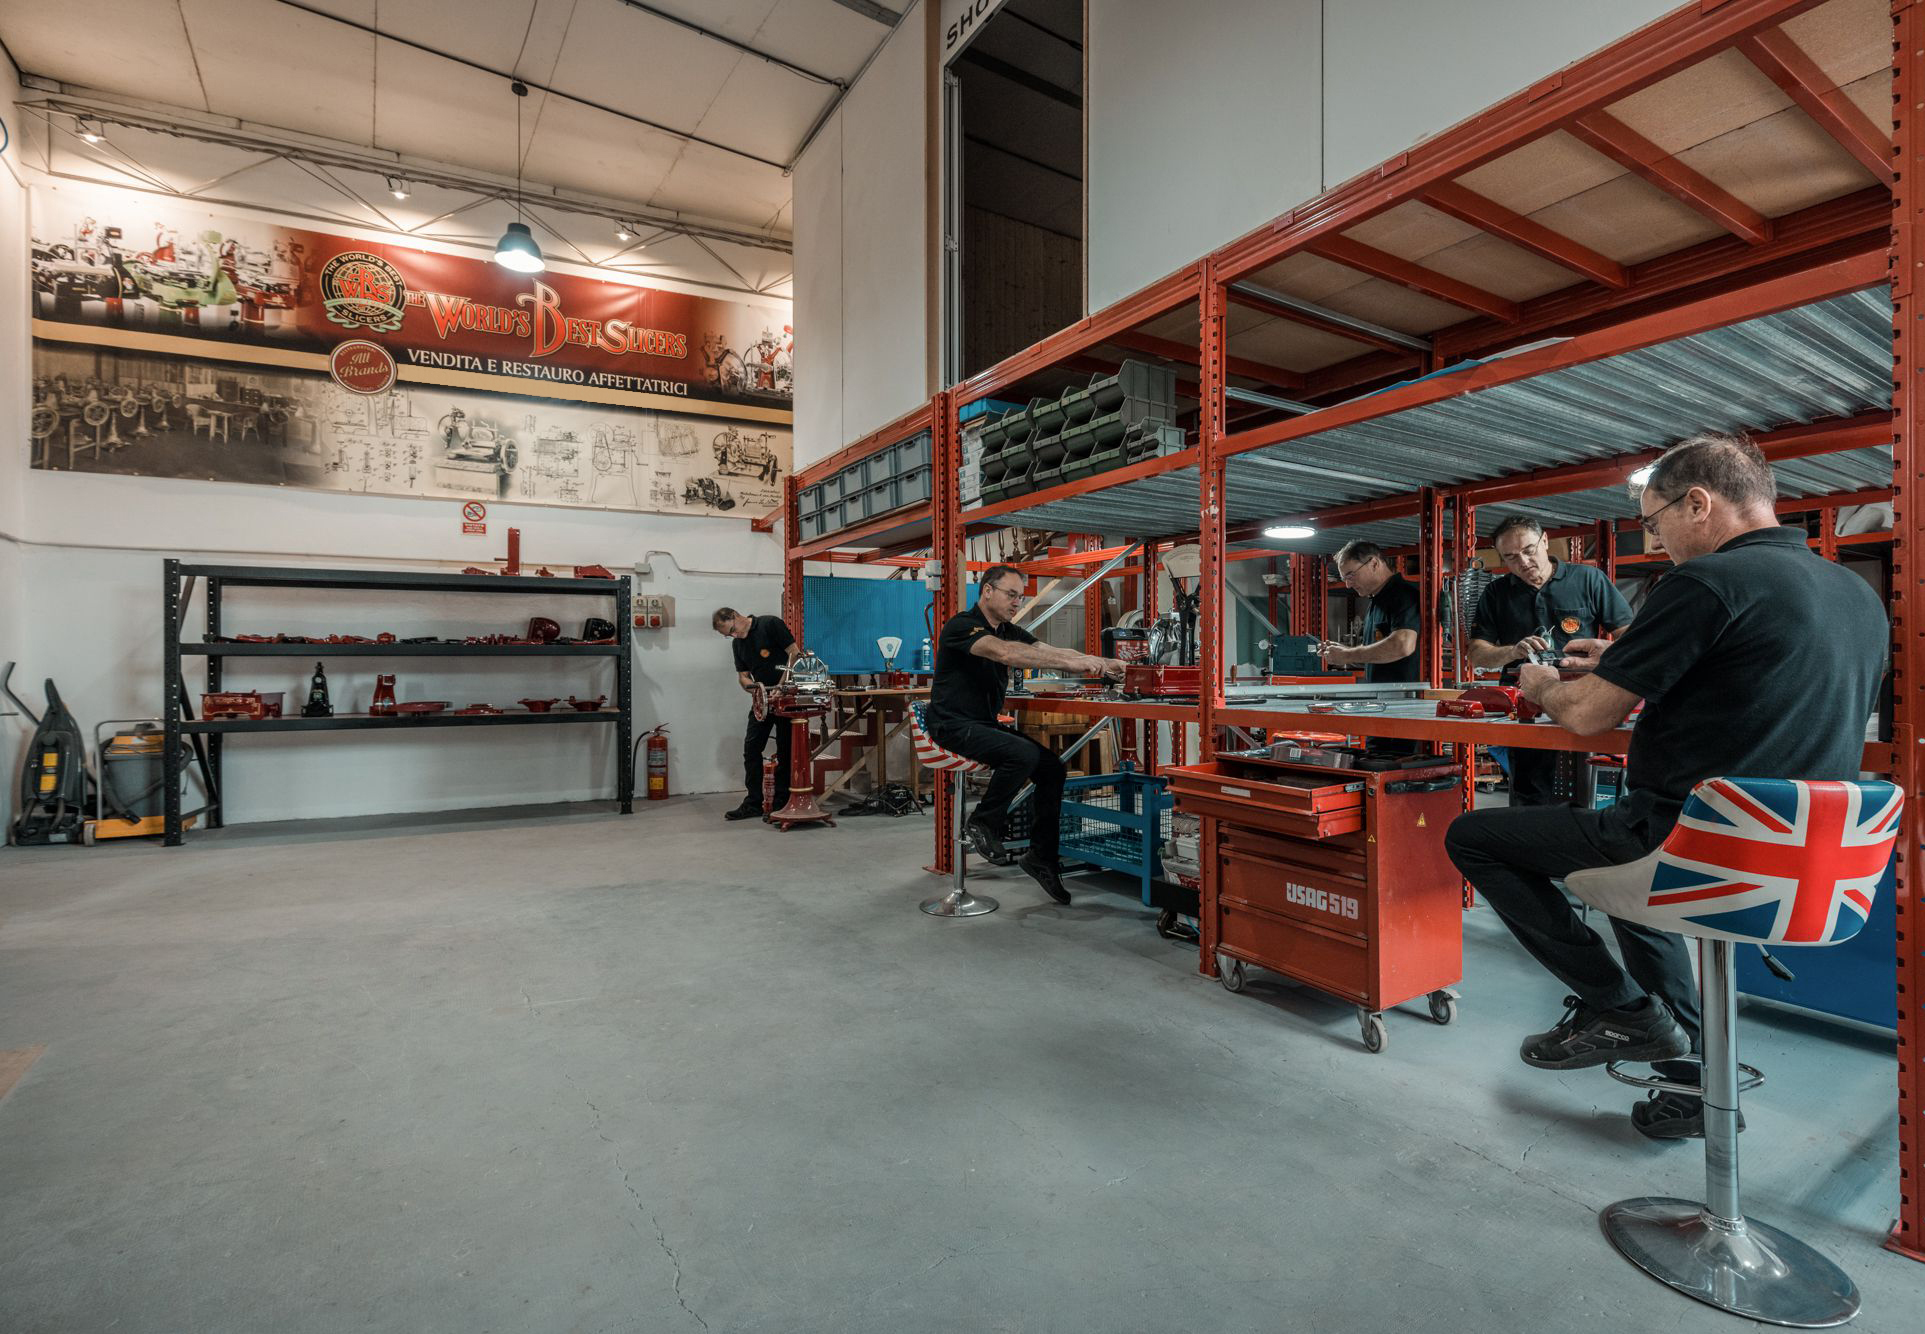 Laboratorio di restauro Berkel, Affettetrici Berkel | Restauro e Vendita